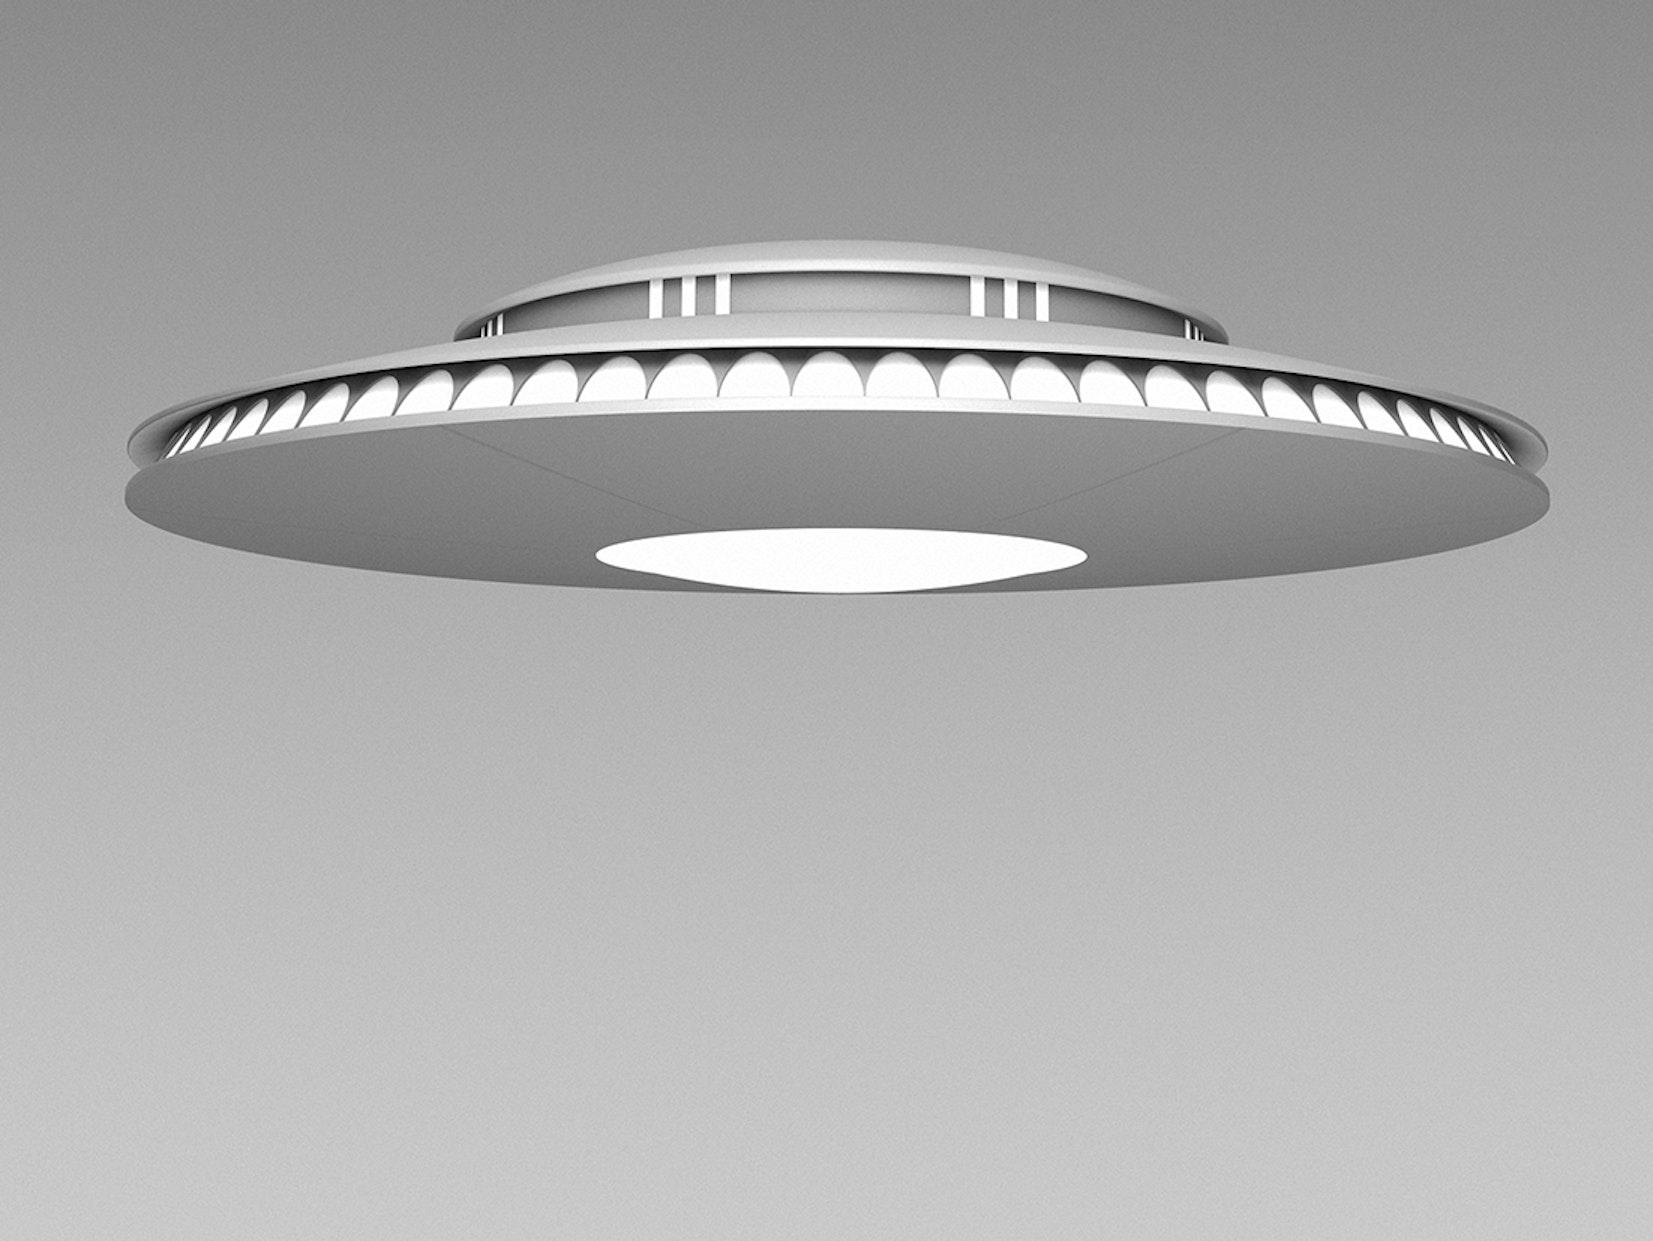 Meet the UFO Expert Who Doesn't Believe in Aliens